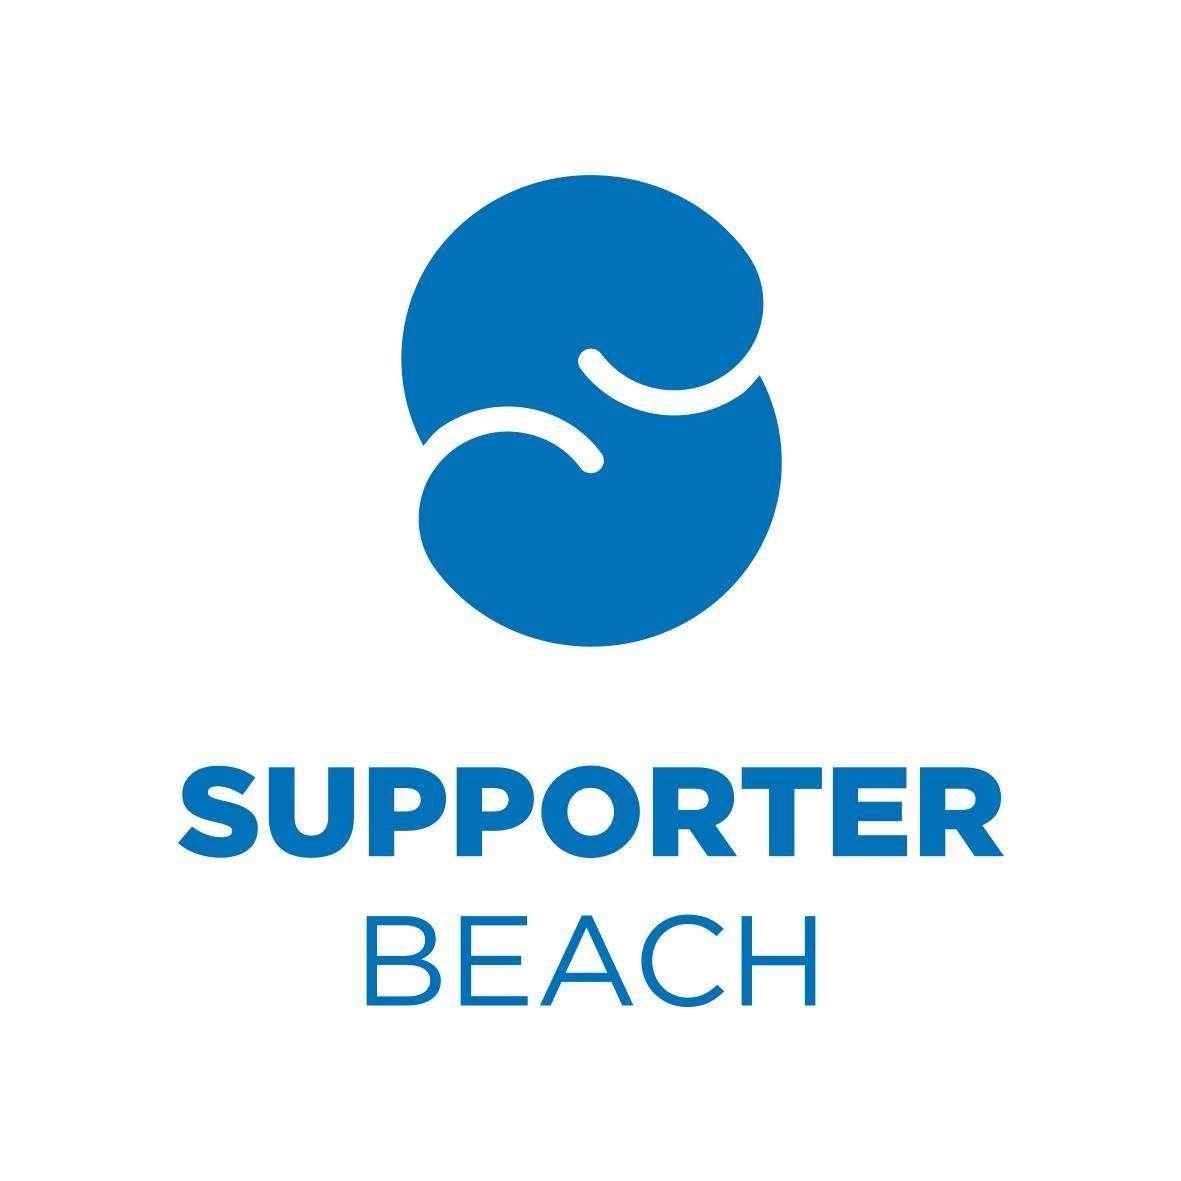 Stabilimento Balneare Supporter Beach